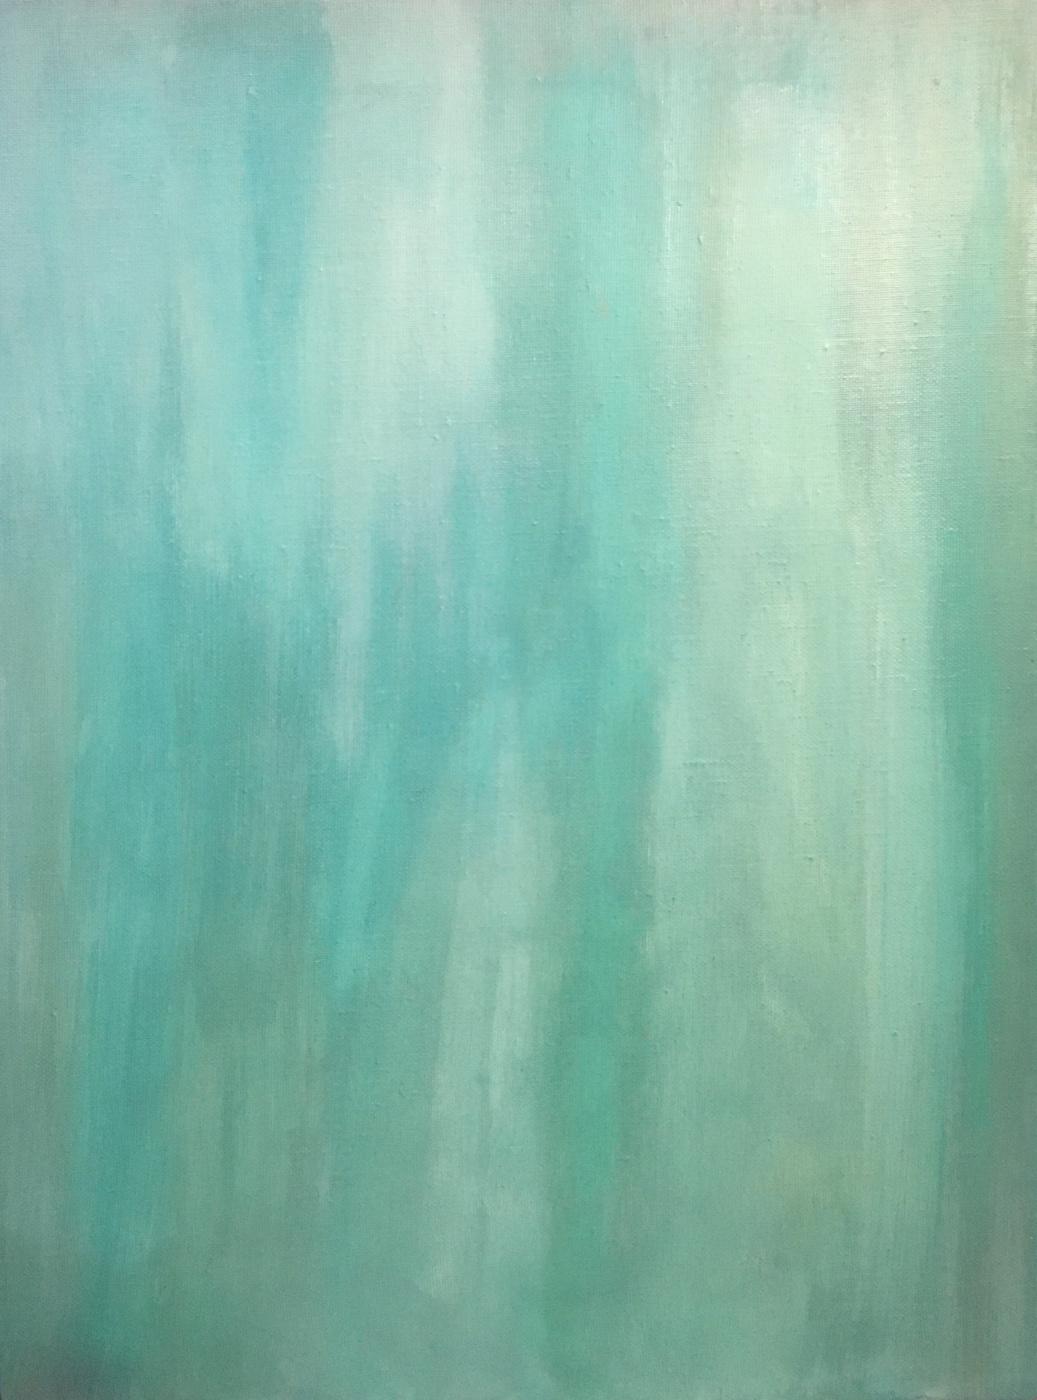 Yuri K. Abstraction 14